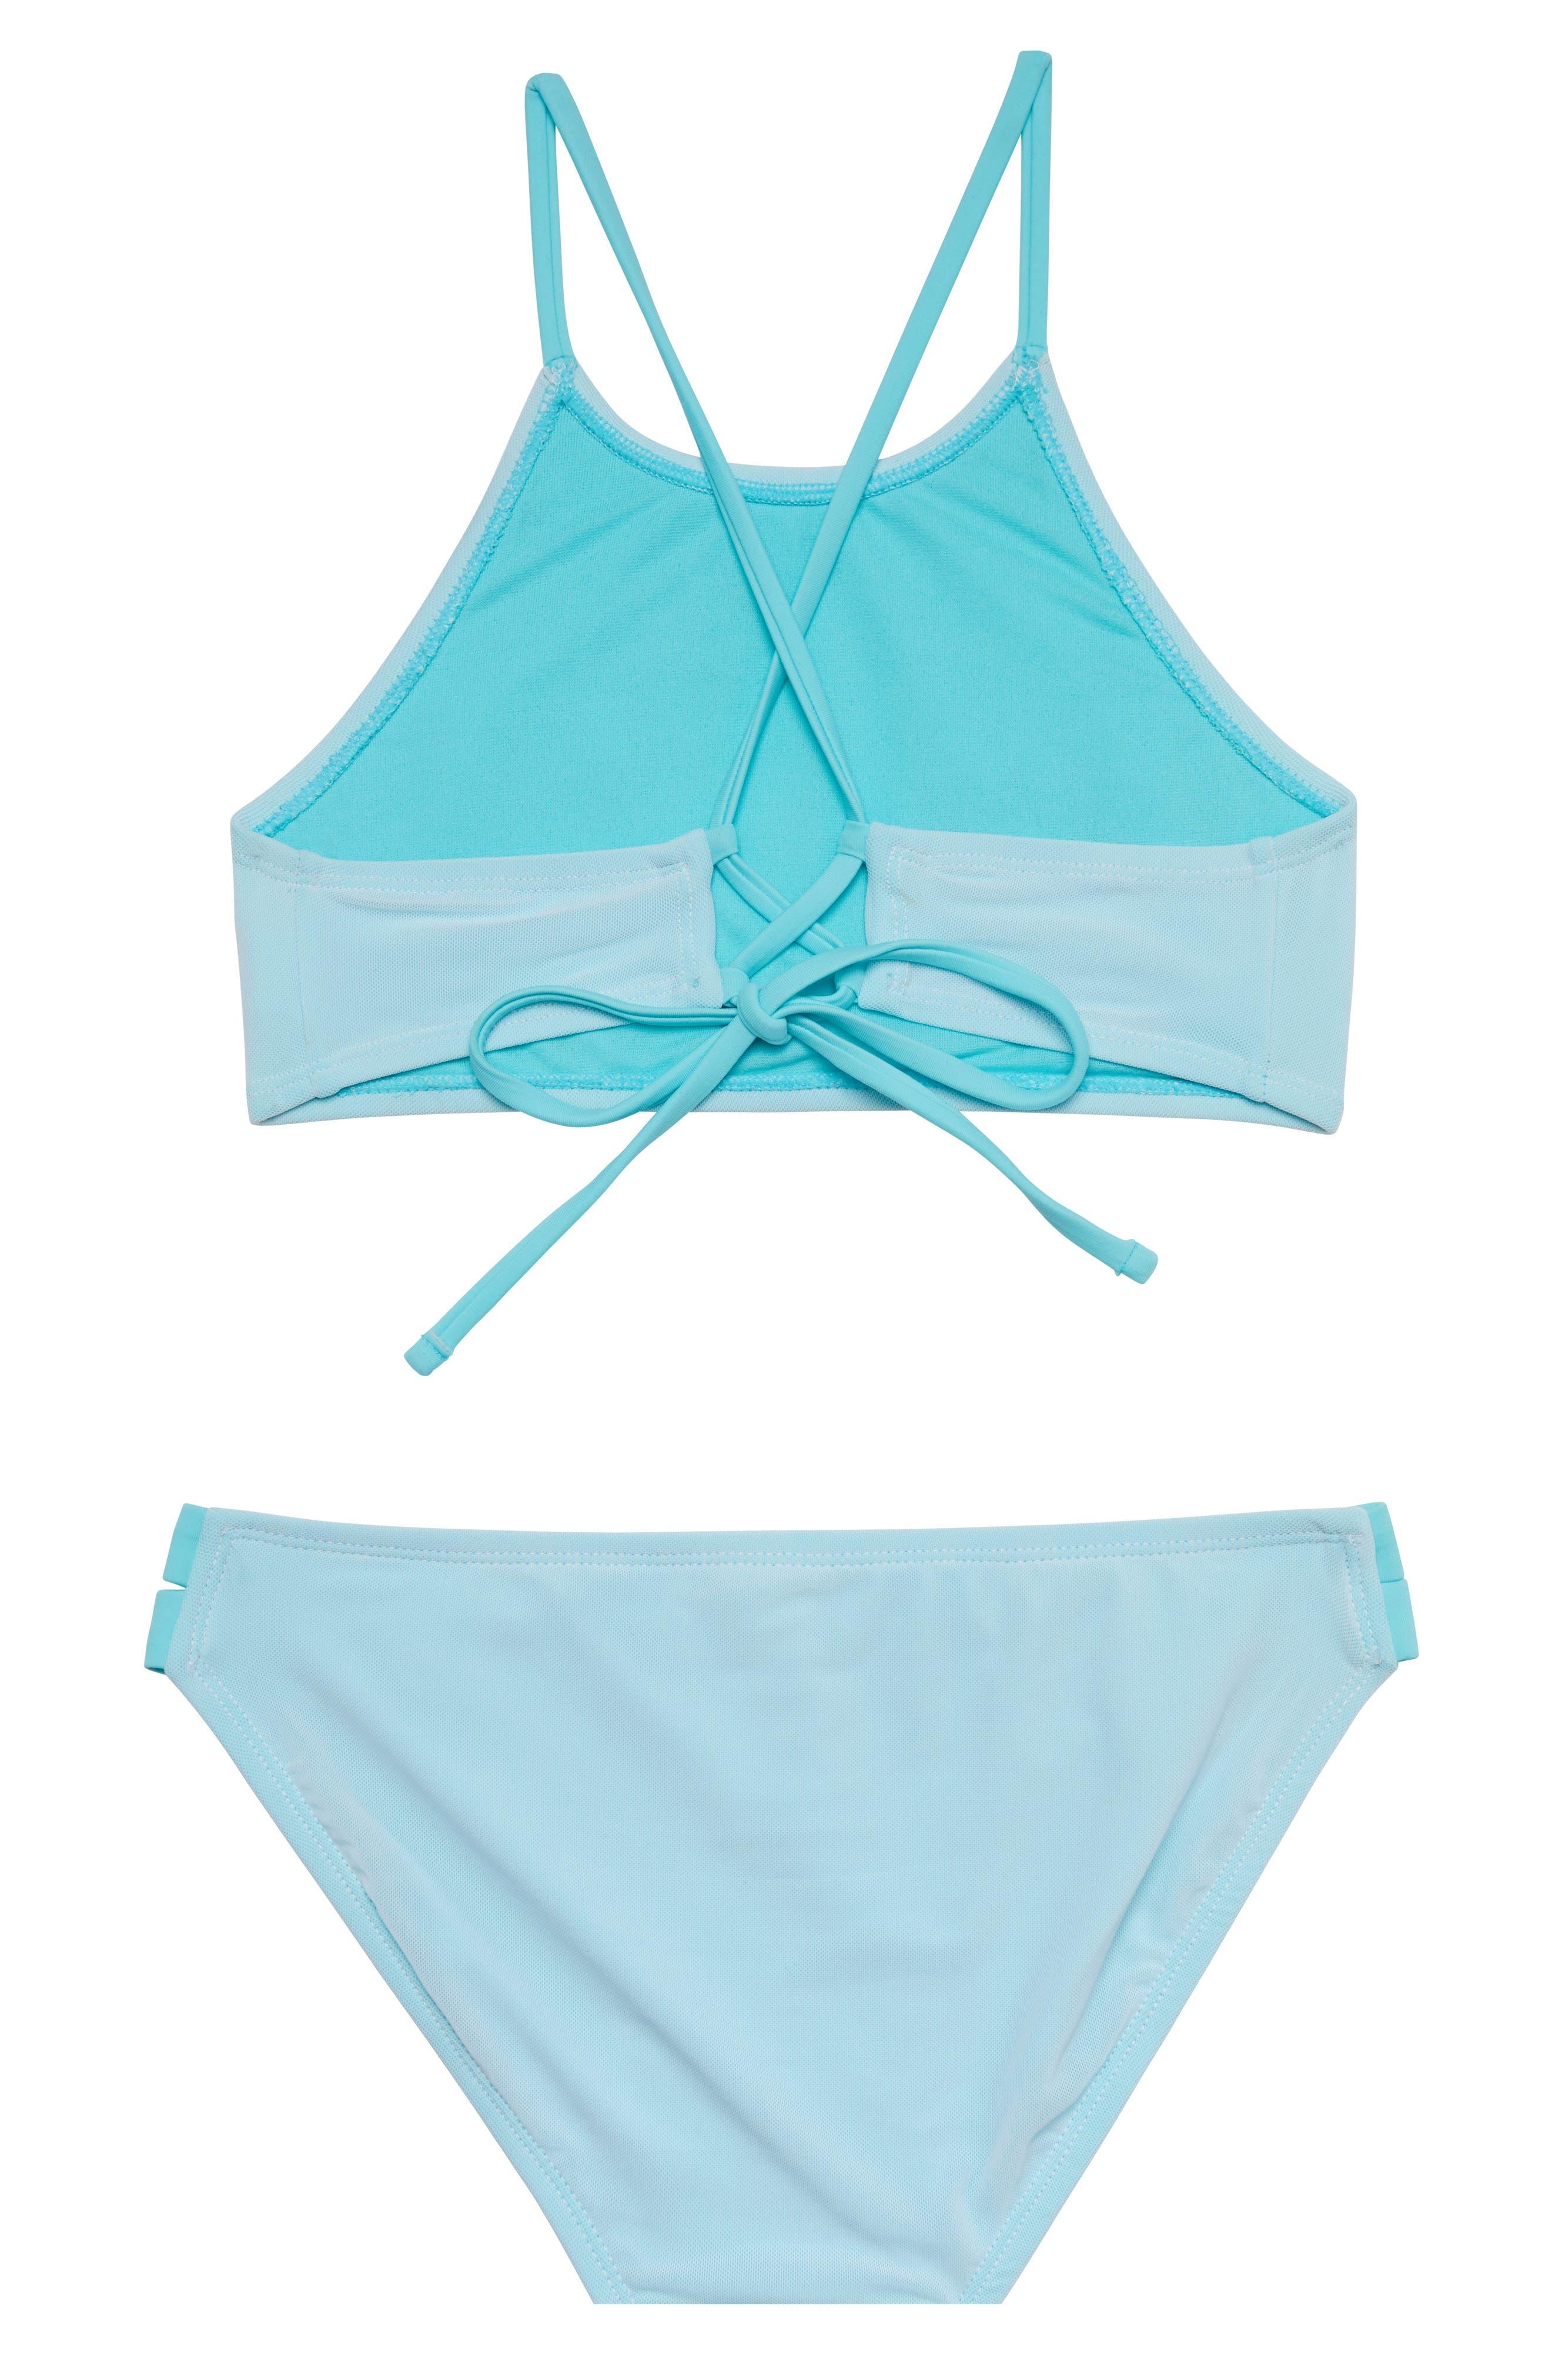 Summer Mesh Two-Piece Swimsuit,                             Alternate thumbnail 2, color,                             BLUE